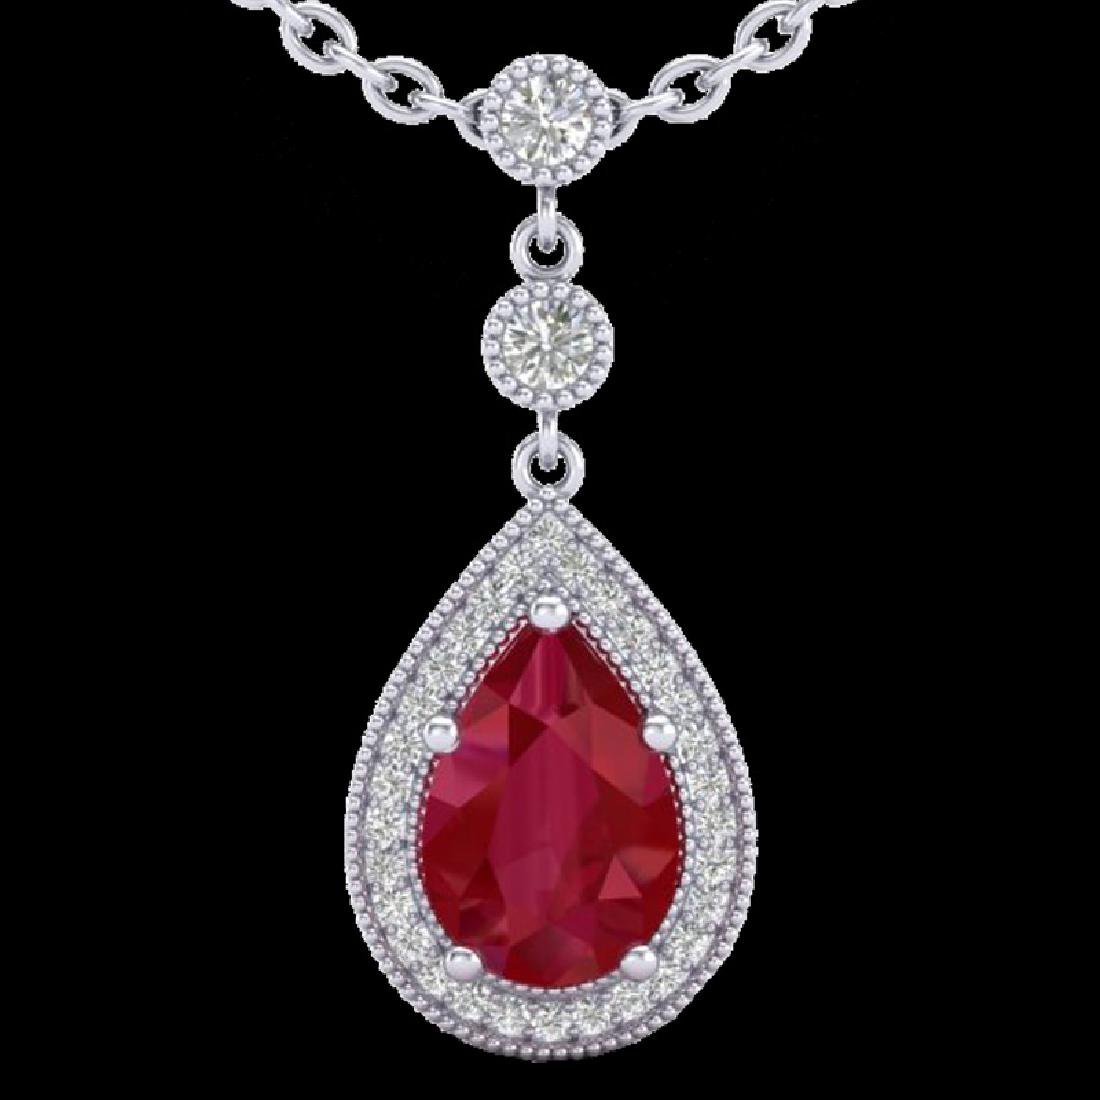 2.75 CTW Ruby & Micro Pave VS/SI Diamond Necklace - 2